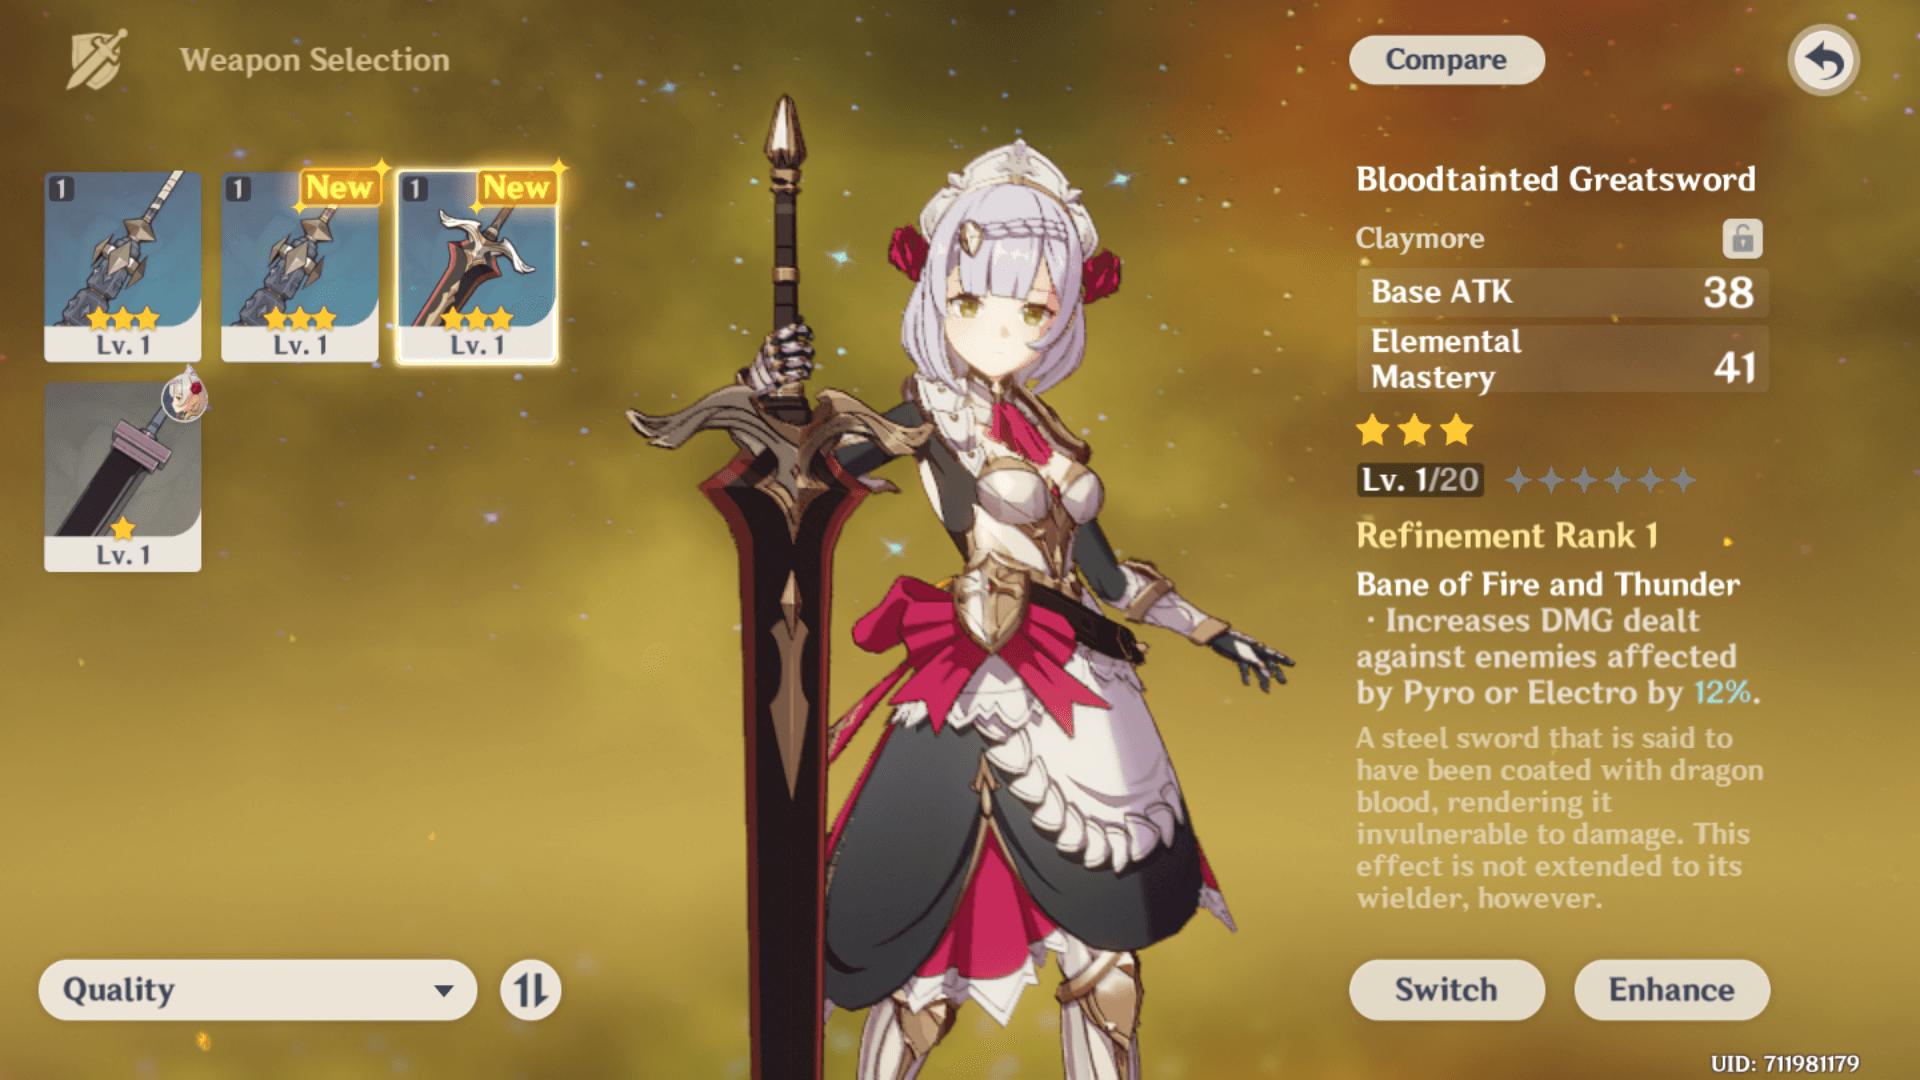 Weapon Selection screenshot of Genshin Impact Mobile video game interface.